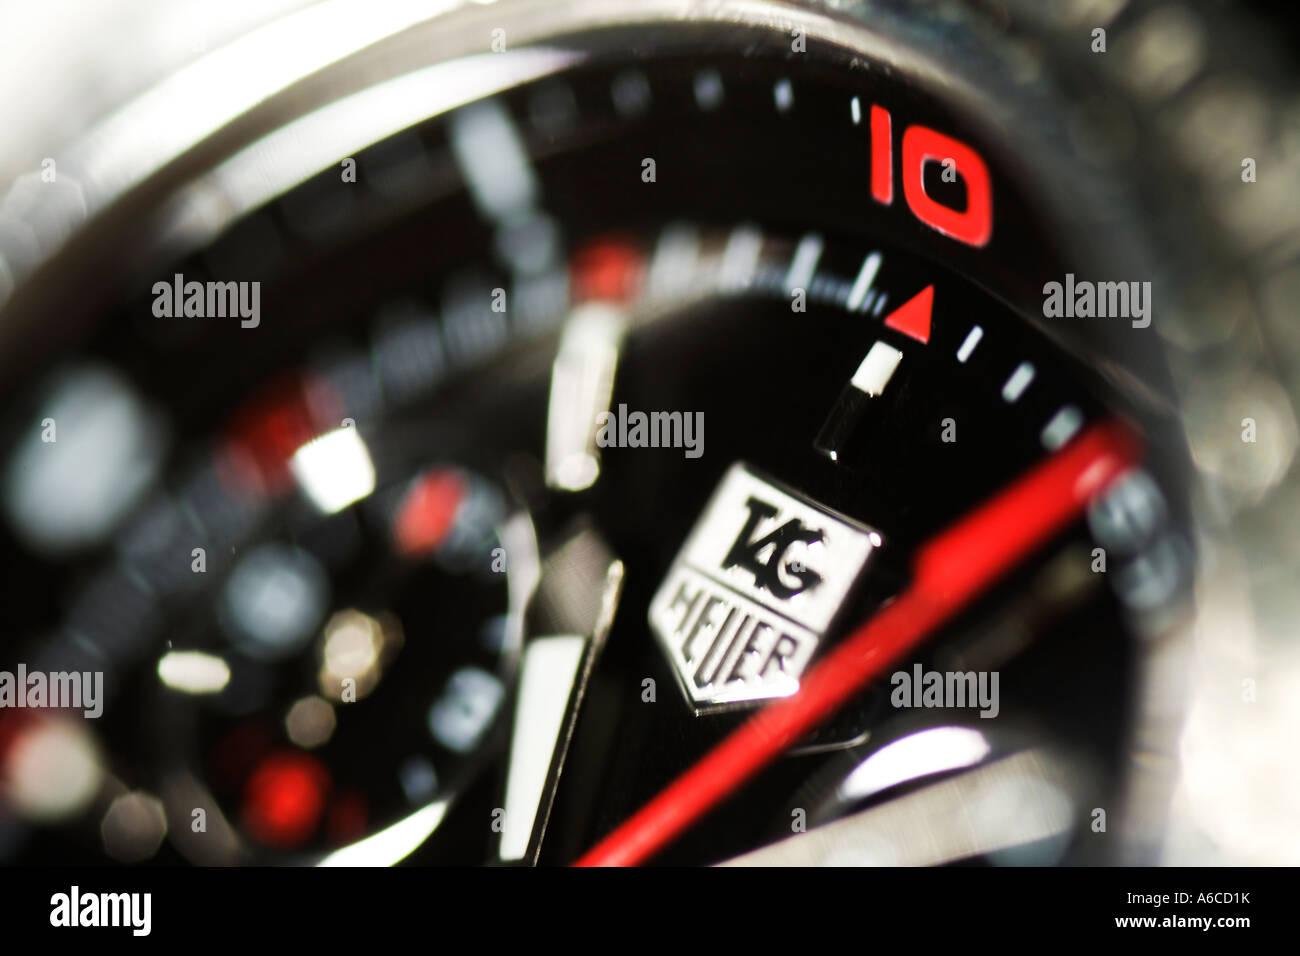 Tag Heuer wristwatch - Stock Image